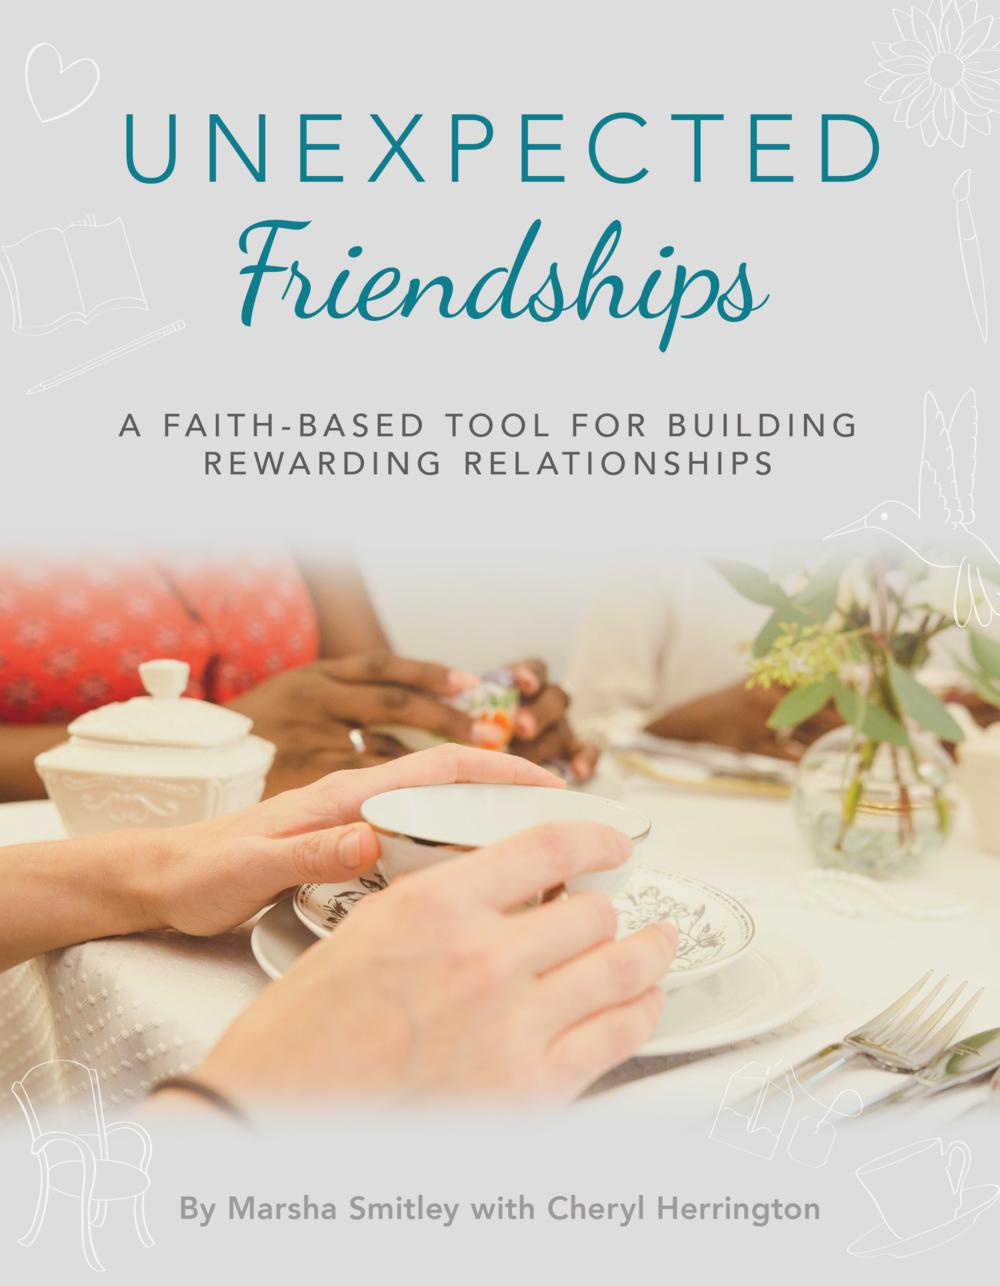 PostScriptOutreach_UnexpectedFriendships-Cover.png